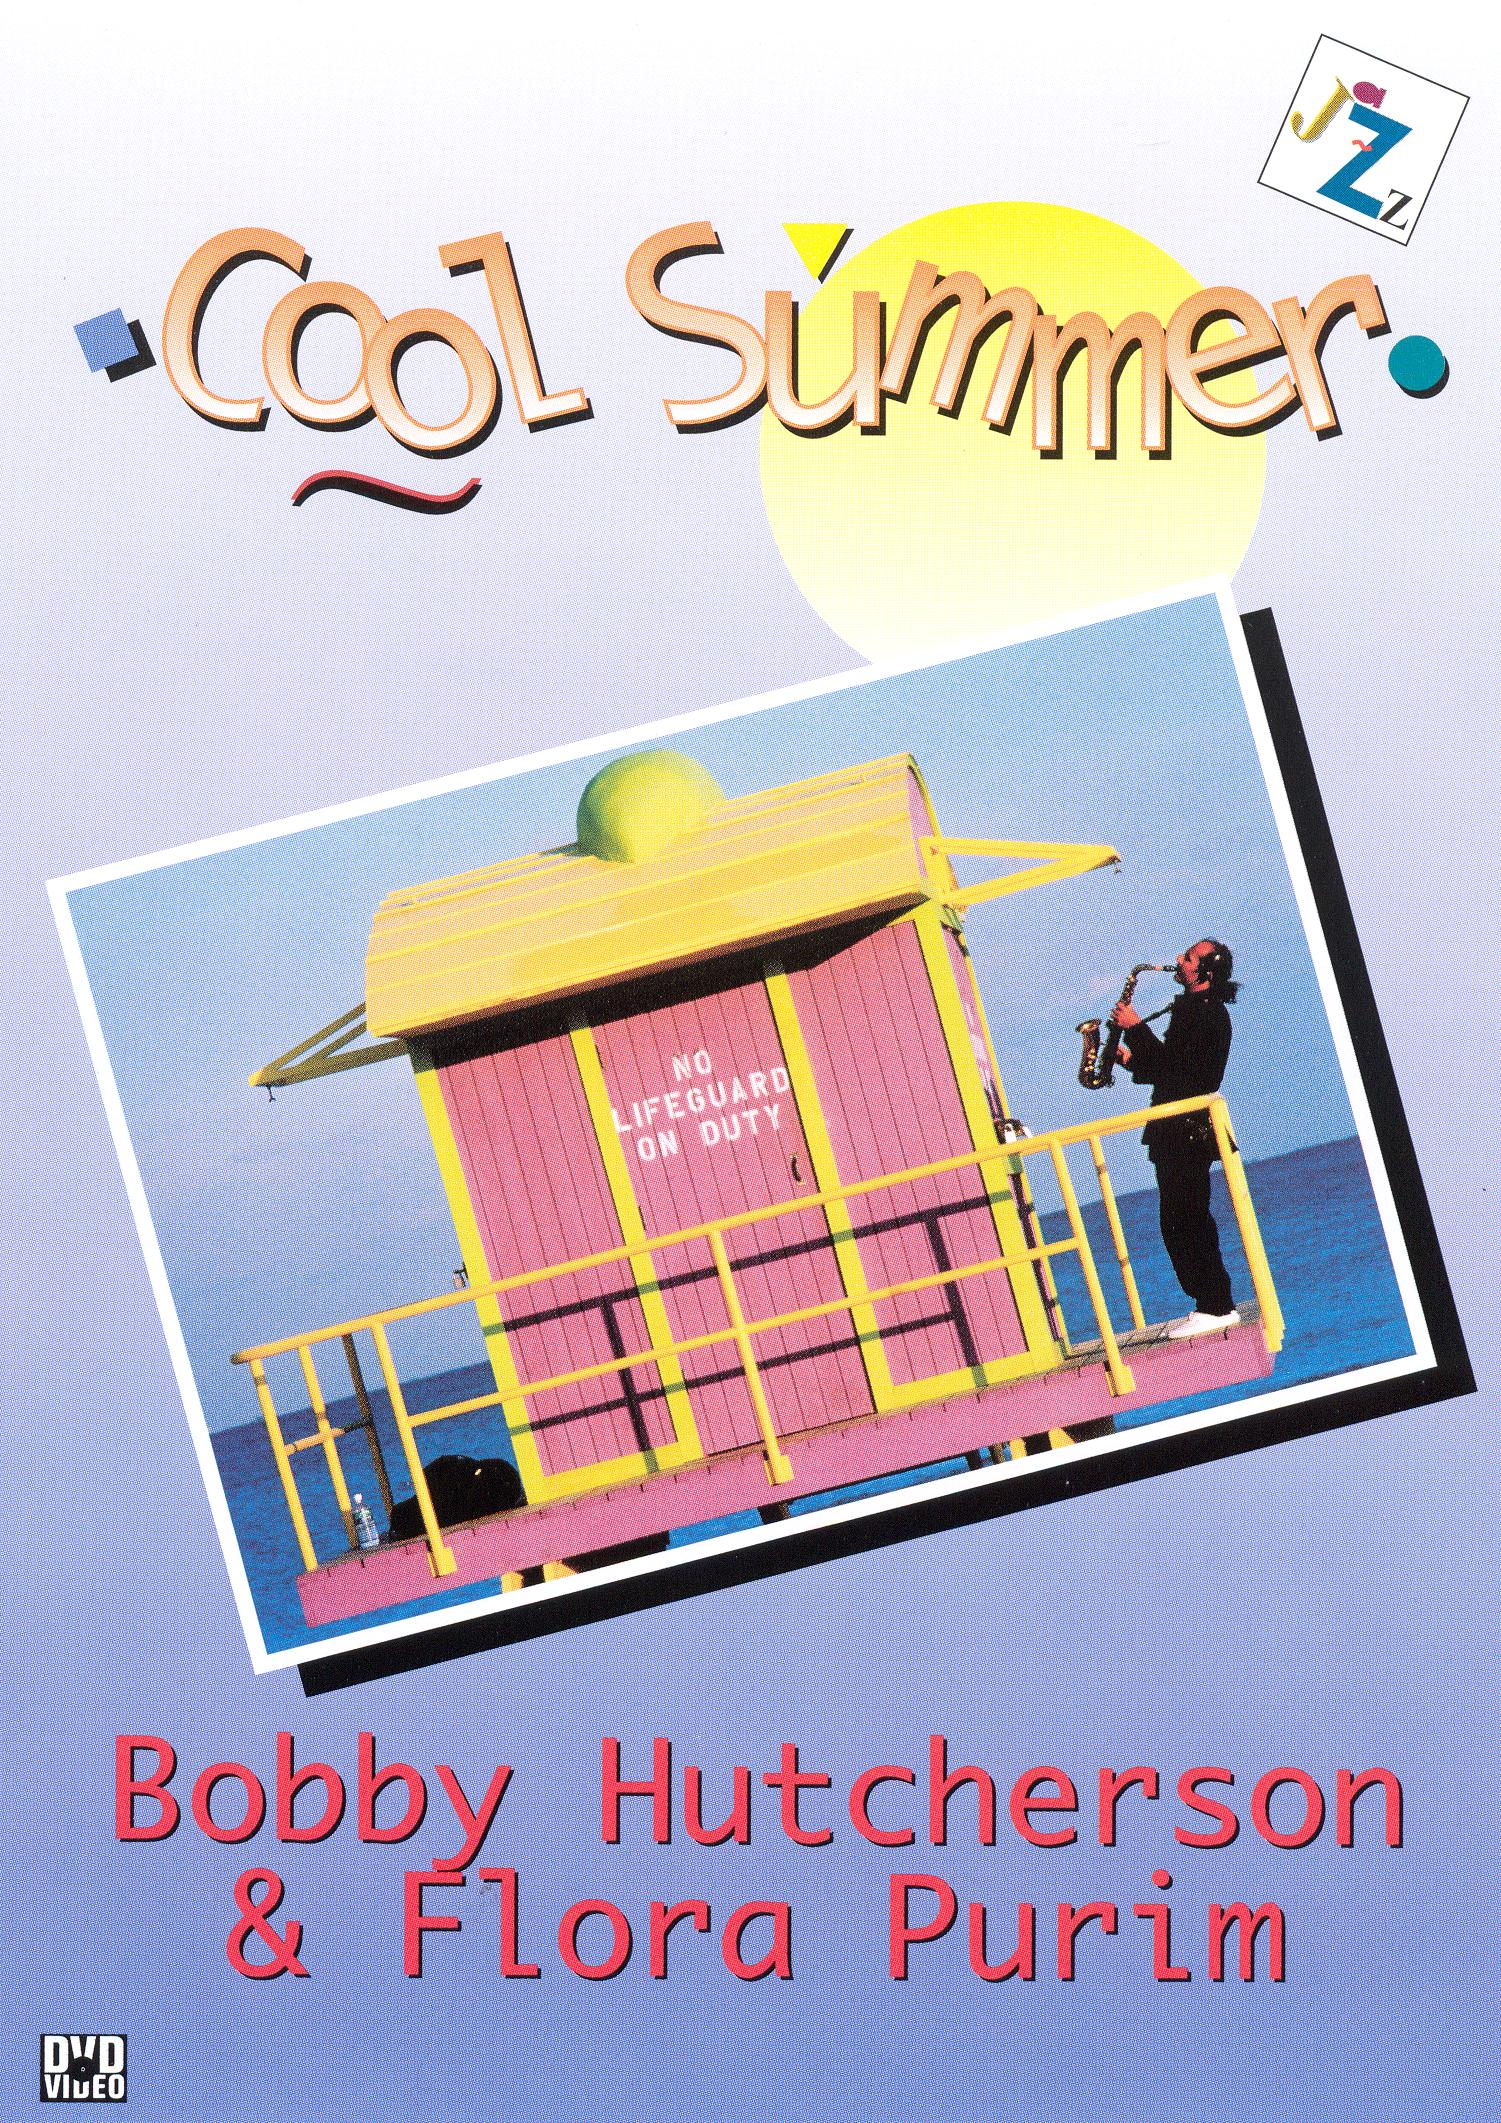 Bobby Hutcherson & Flora Purim: Cool Summer